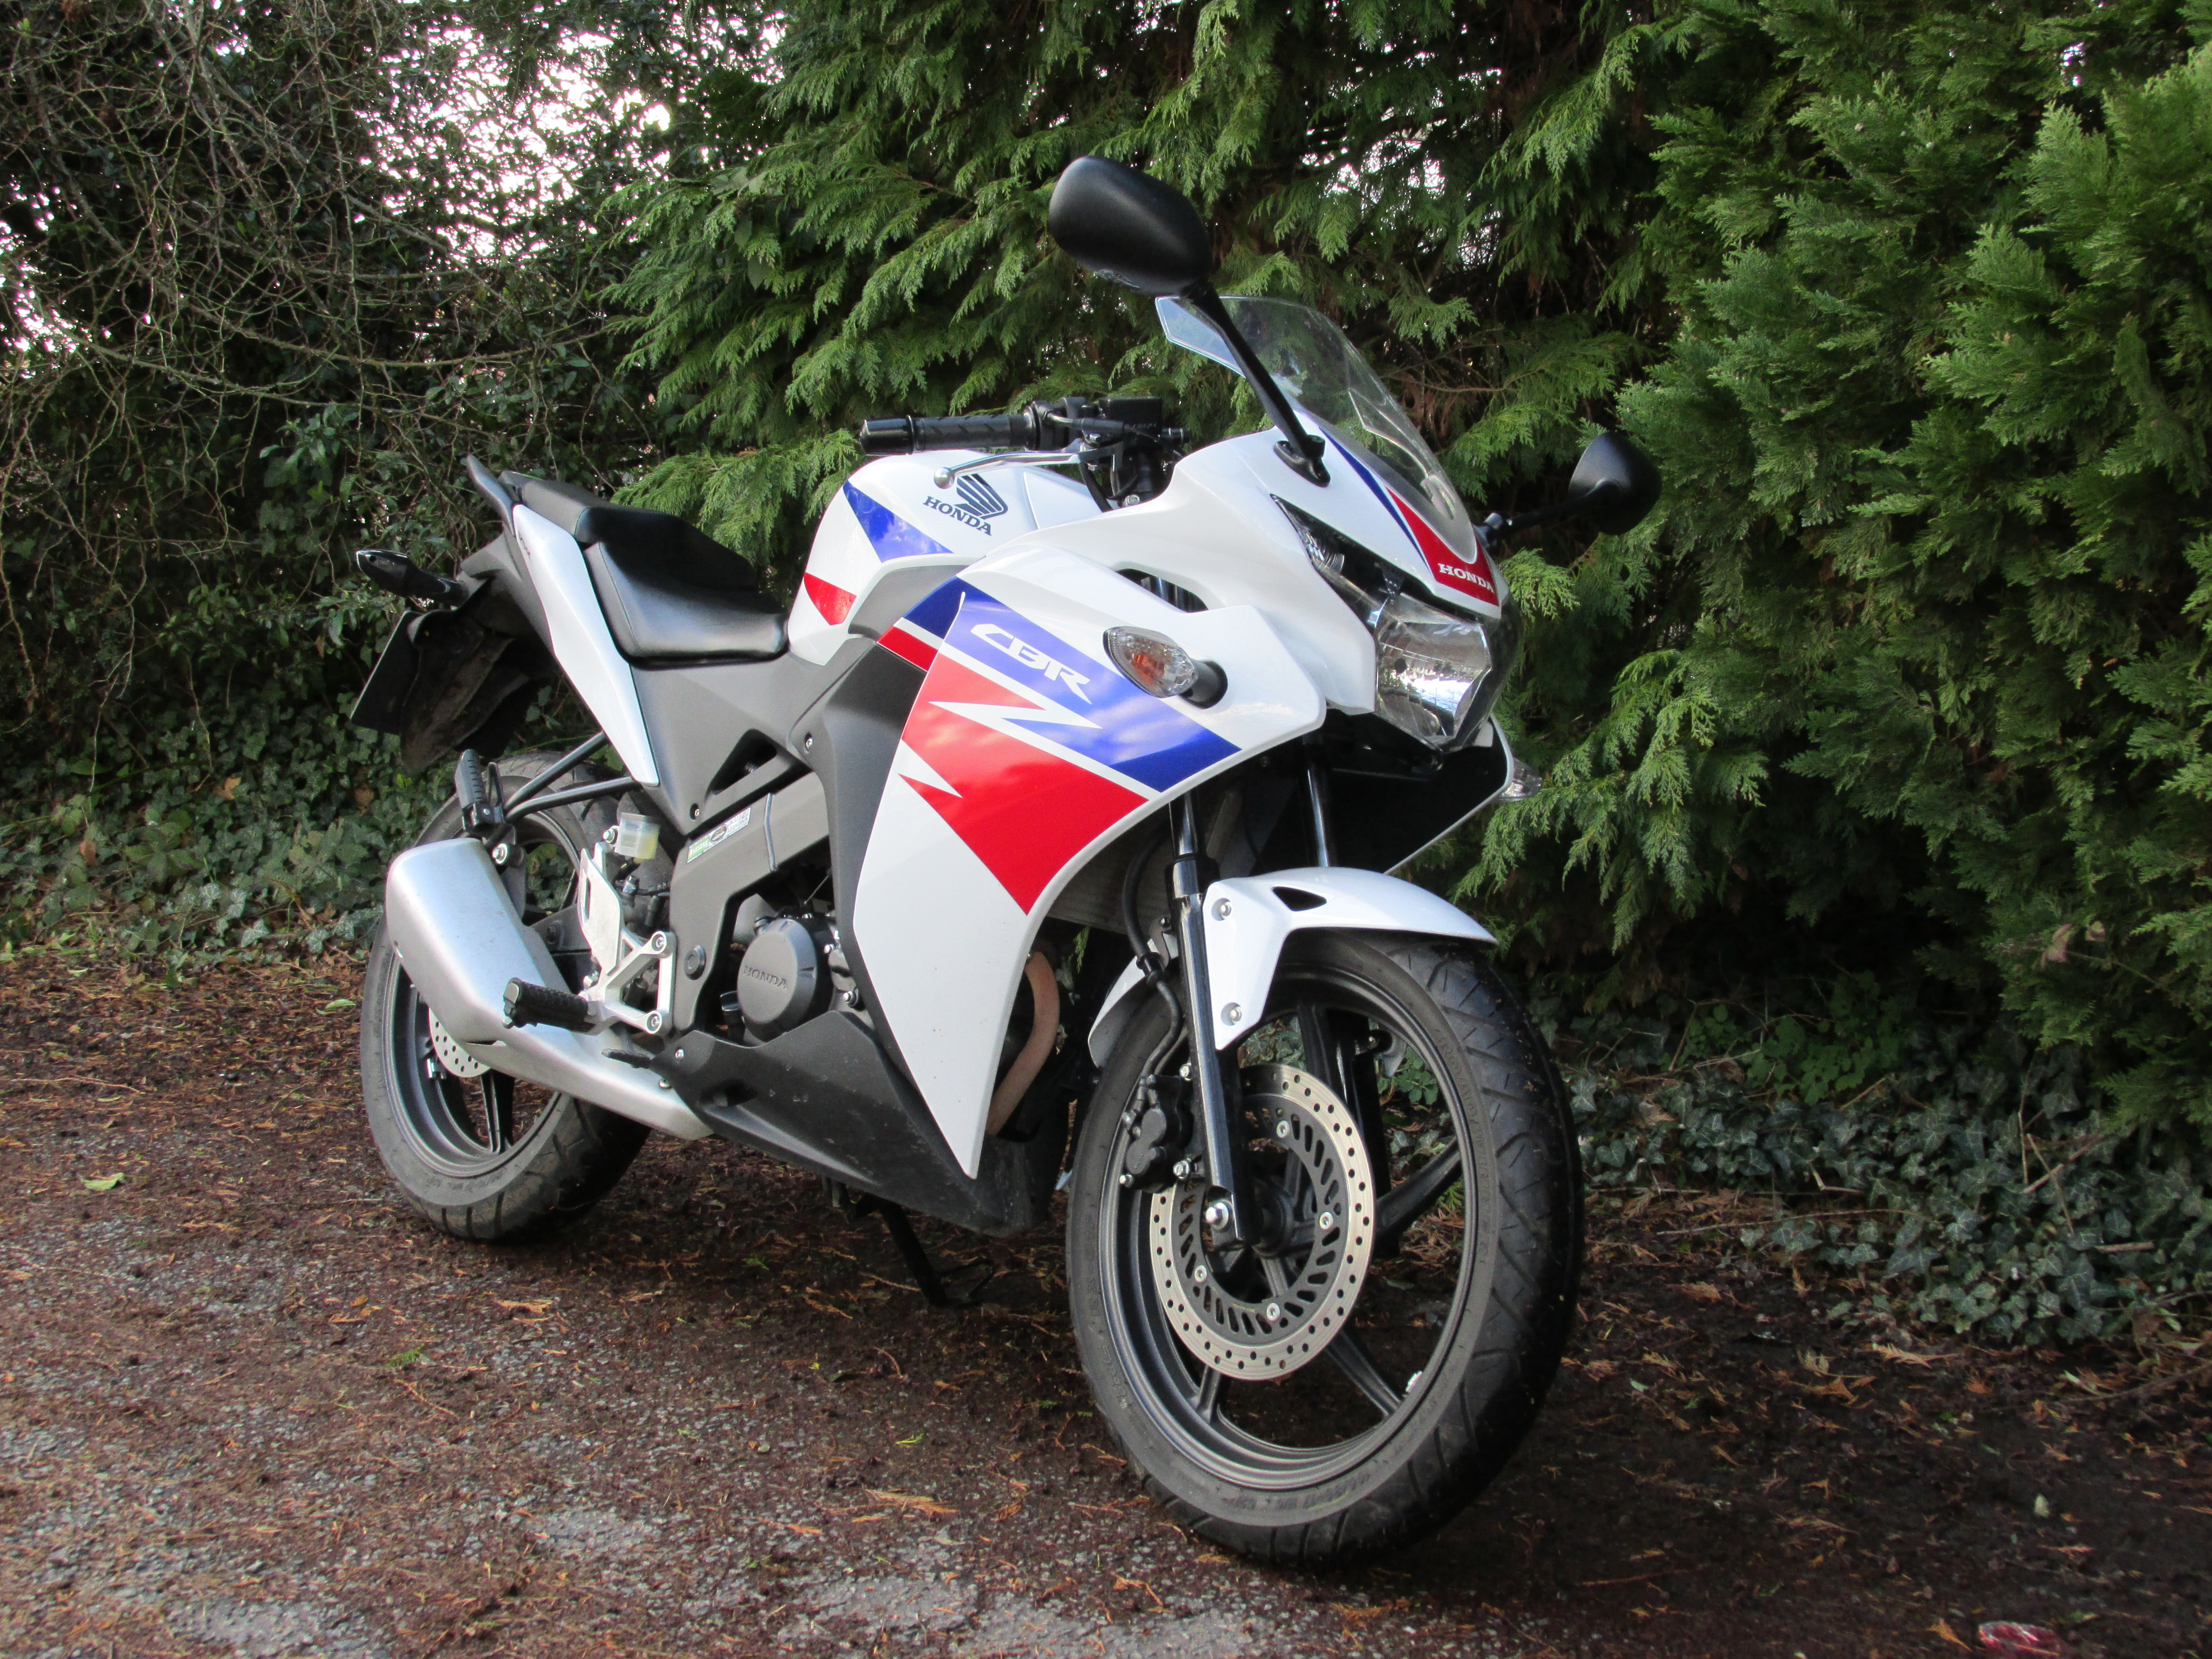 Review: One week with a Honda CBR125R | Visordown